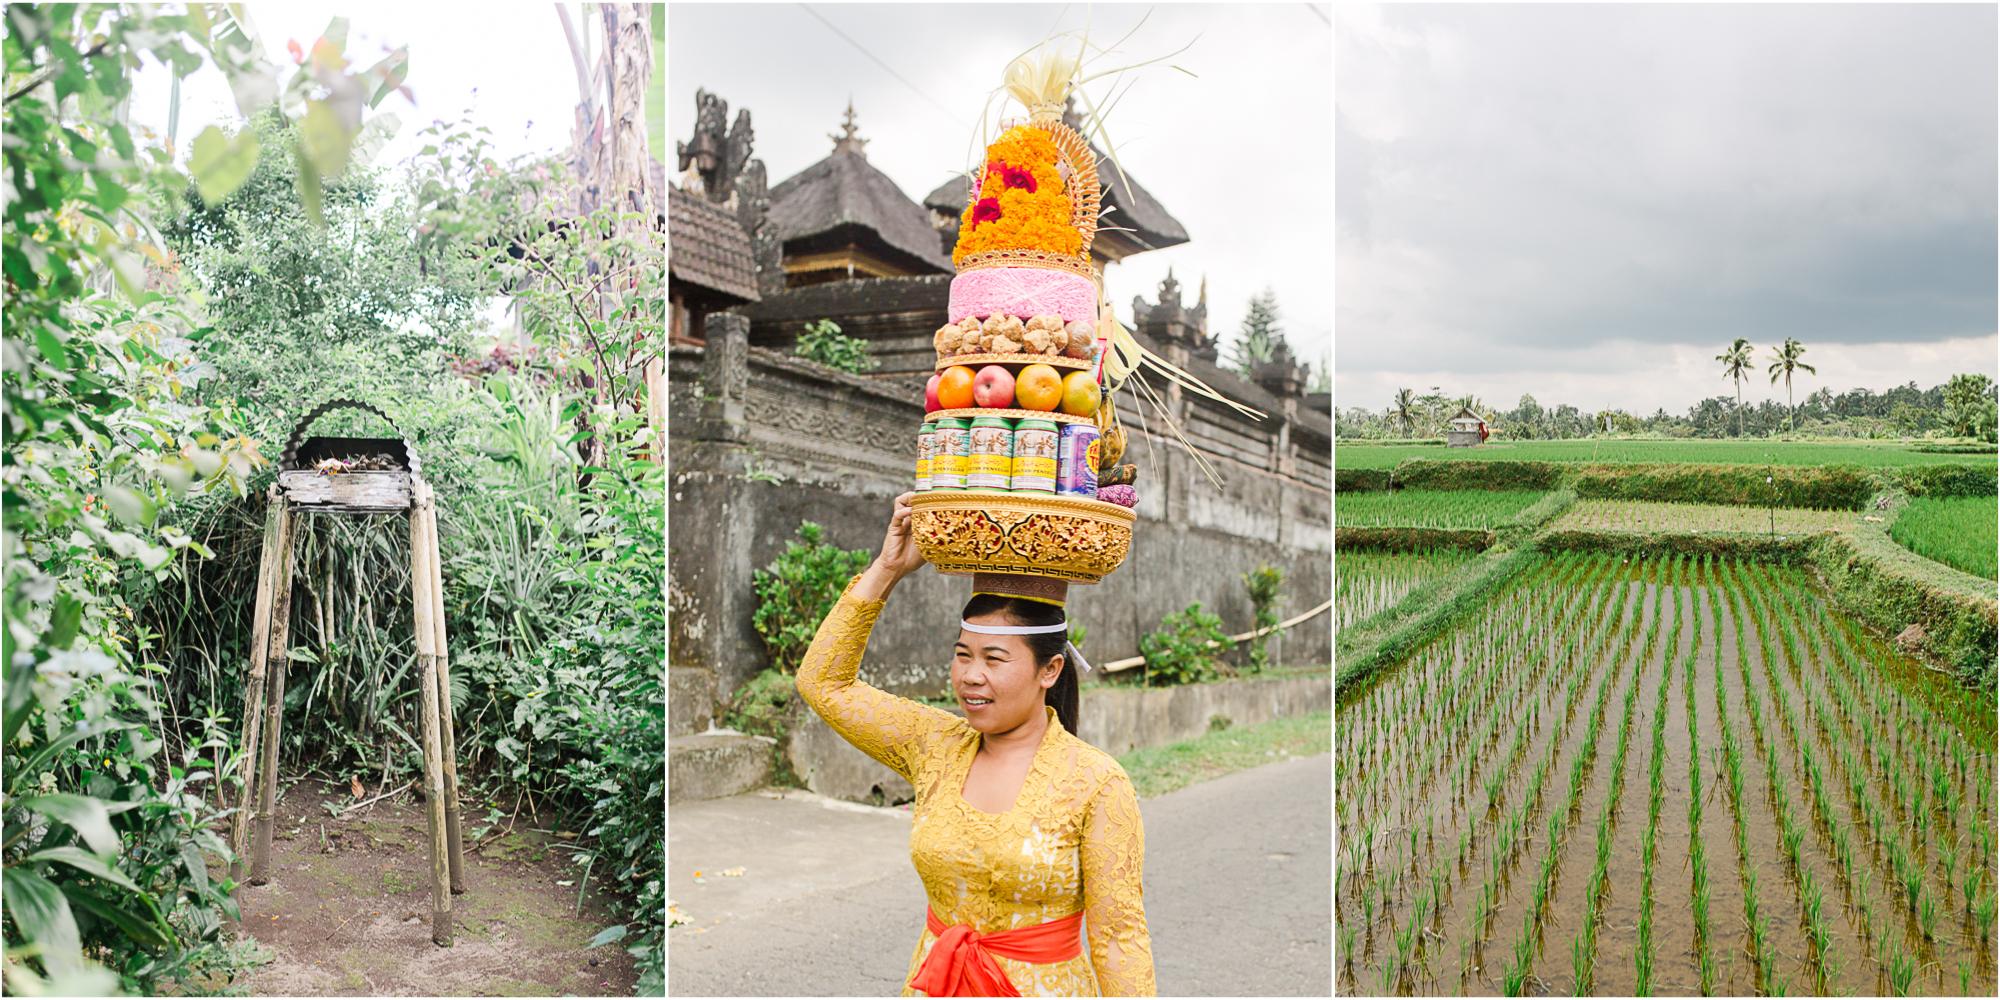 Maine Wedding Photographer Travels to Bali 31.jpg